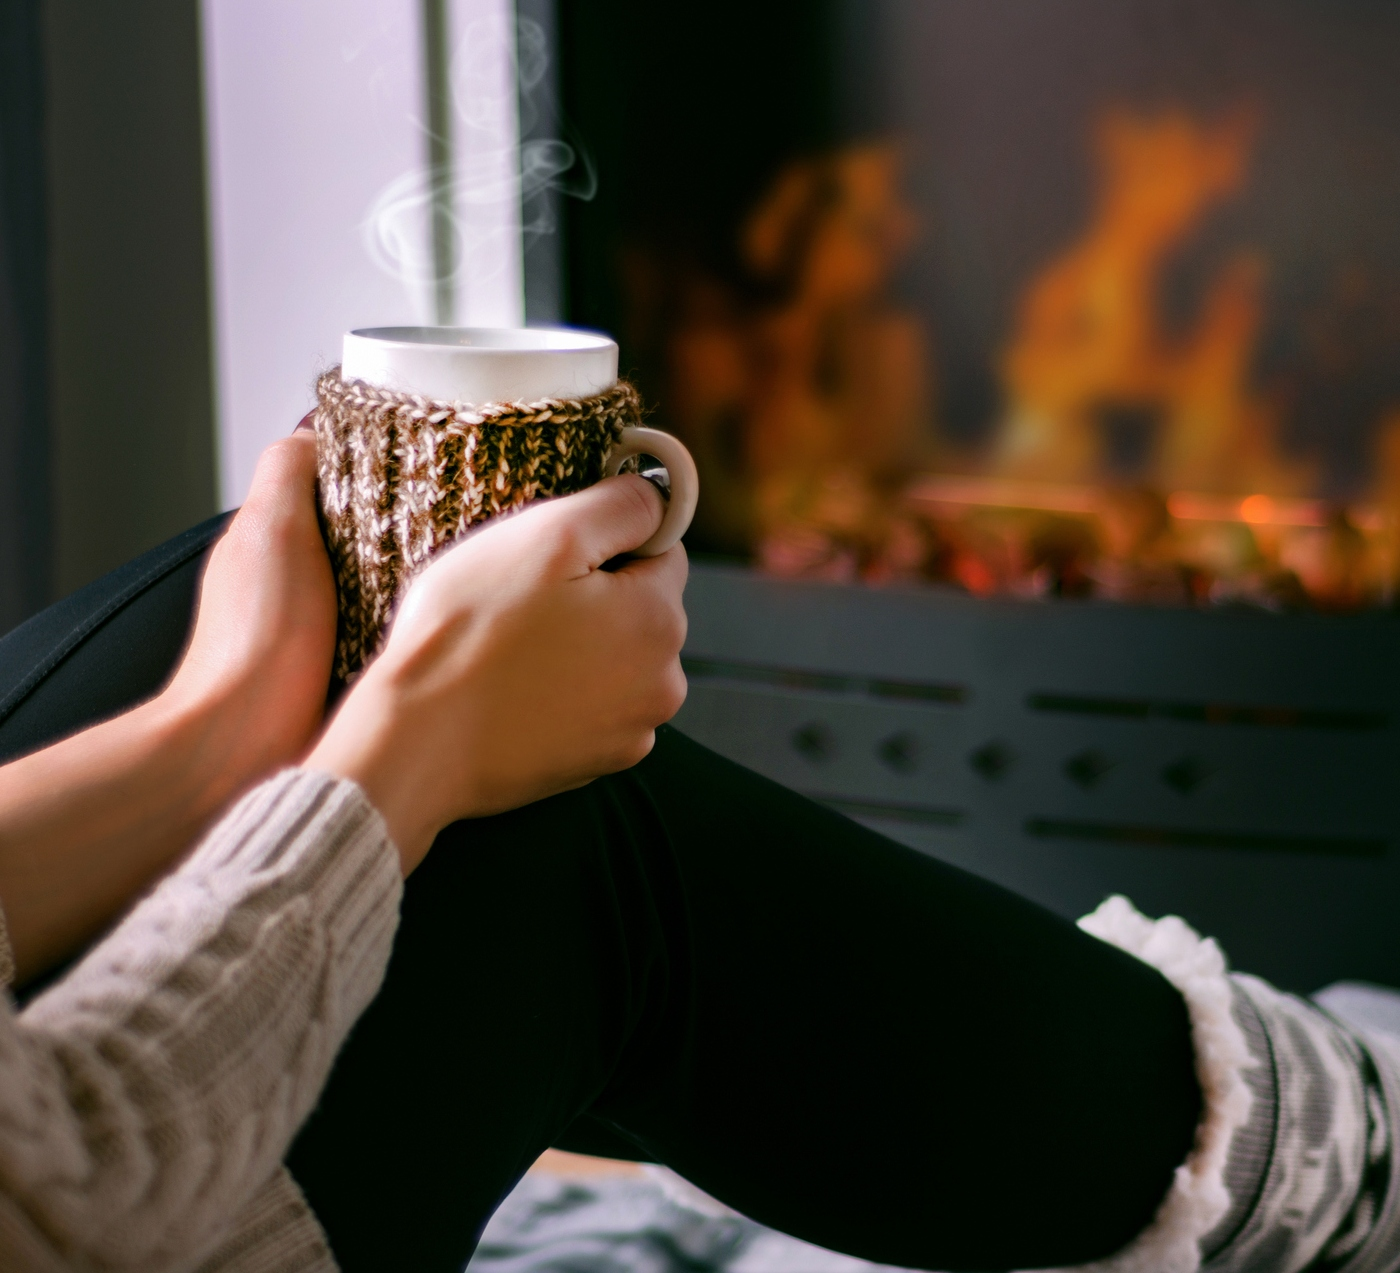 mulher bebe chá no inverno